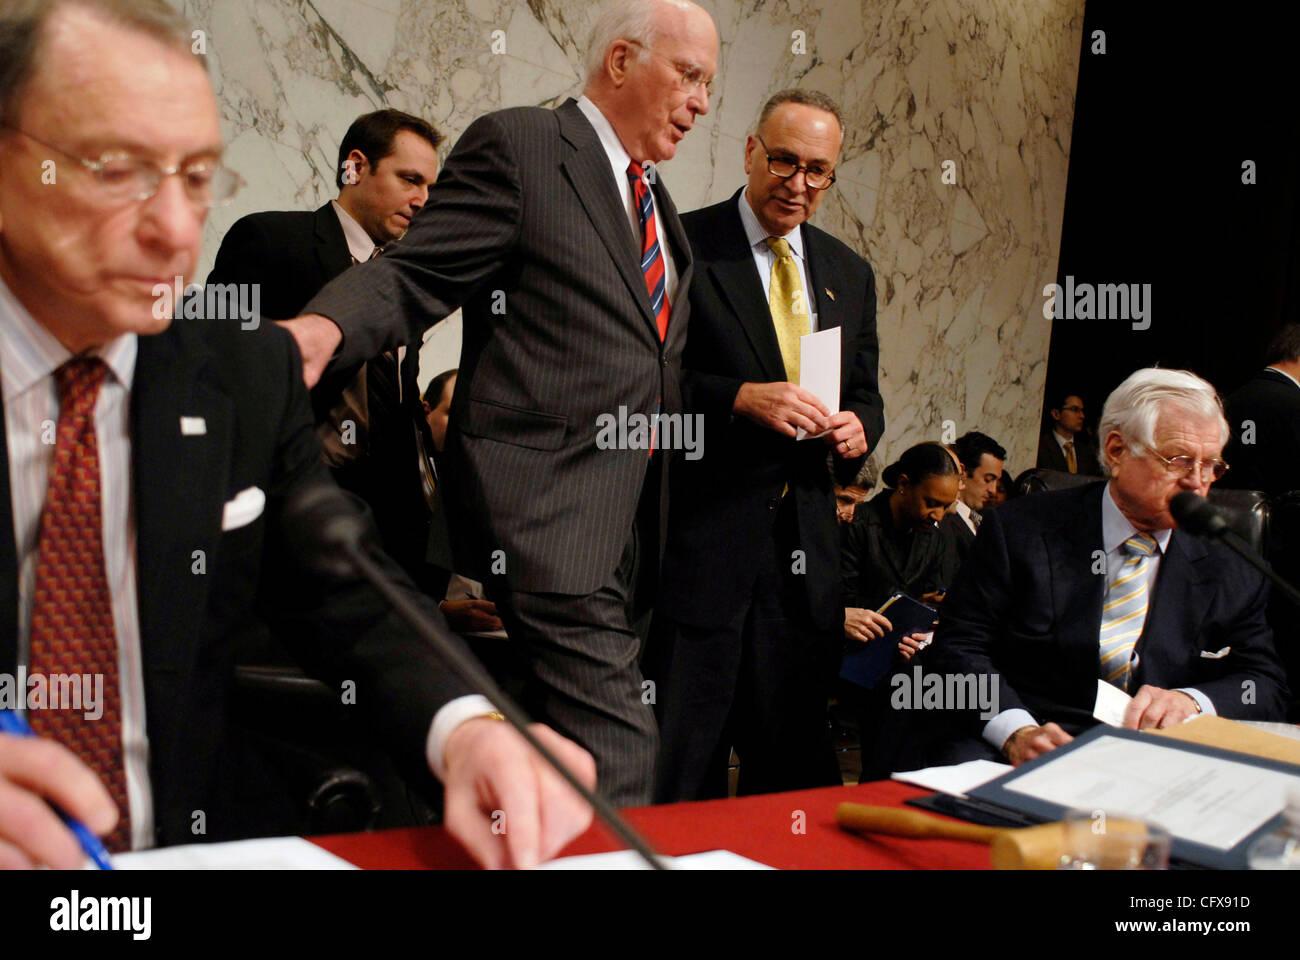 Mar 29, 2007 - Washington, DC, USA - Senate Judiciary committee chairman Senate Judiciary committee chairman PATRICK Stock Photo